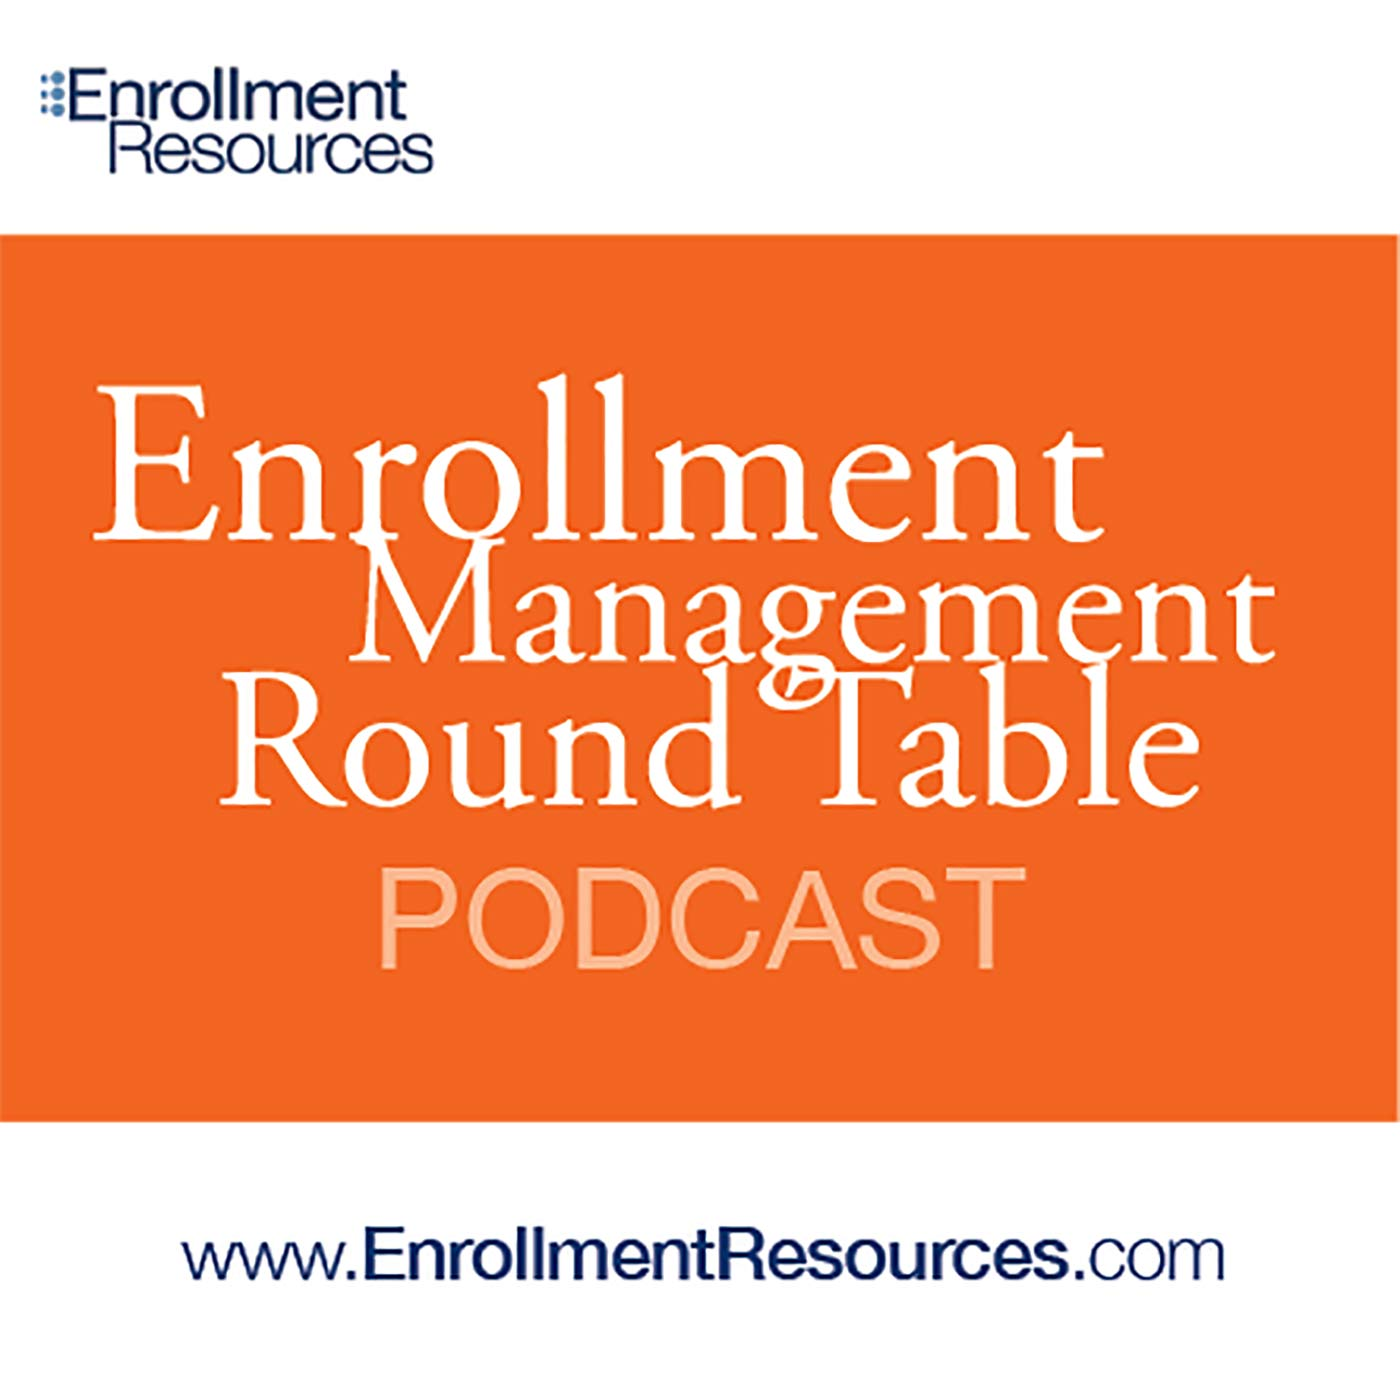 Enrollment Resources Roundtable Podcast